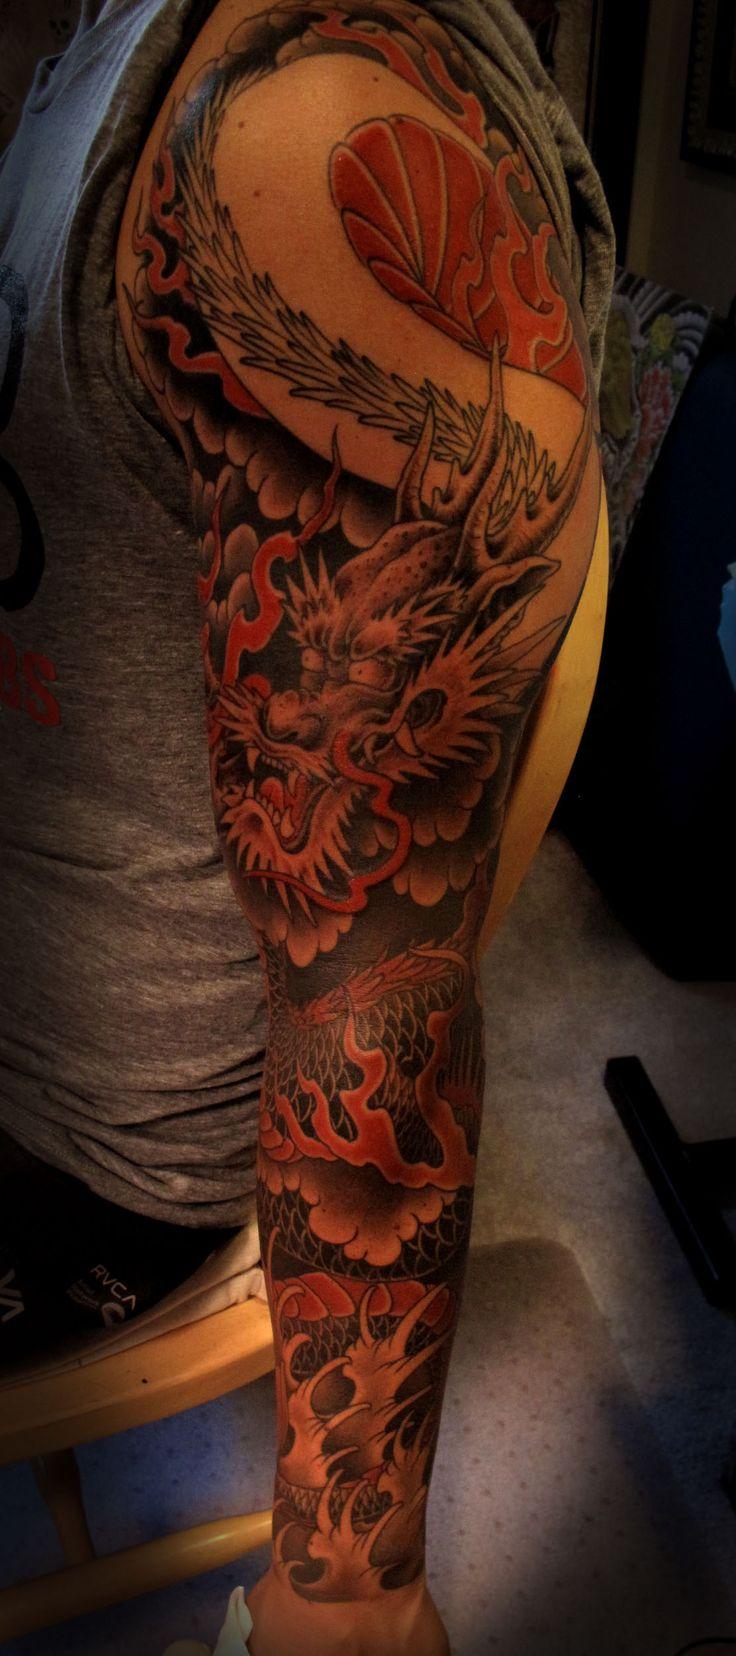 Chris Garver Dragon Tattoo Designs